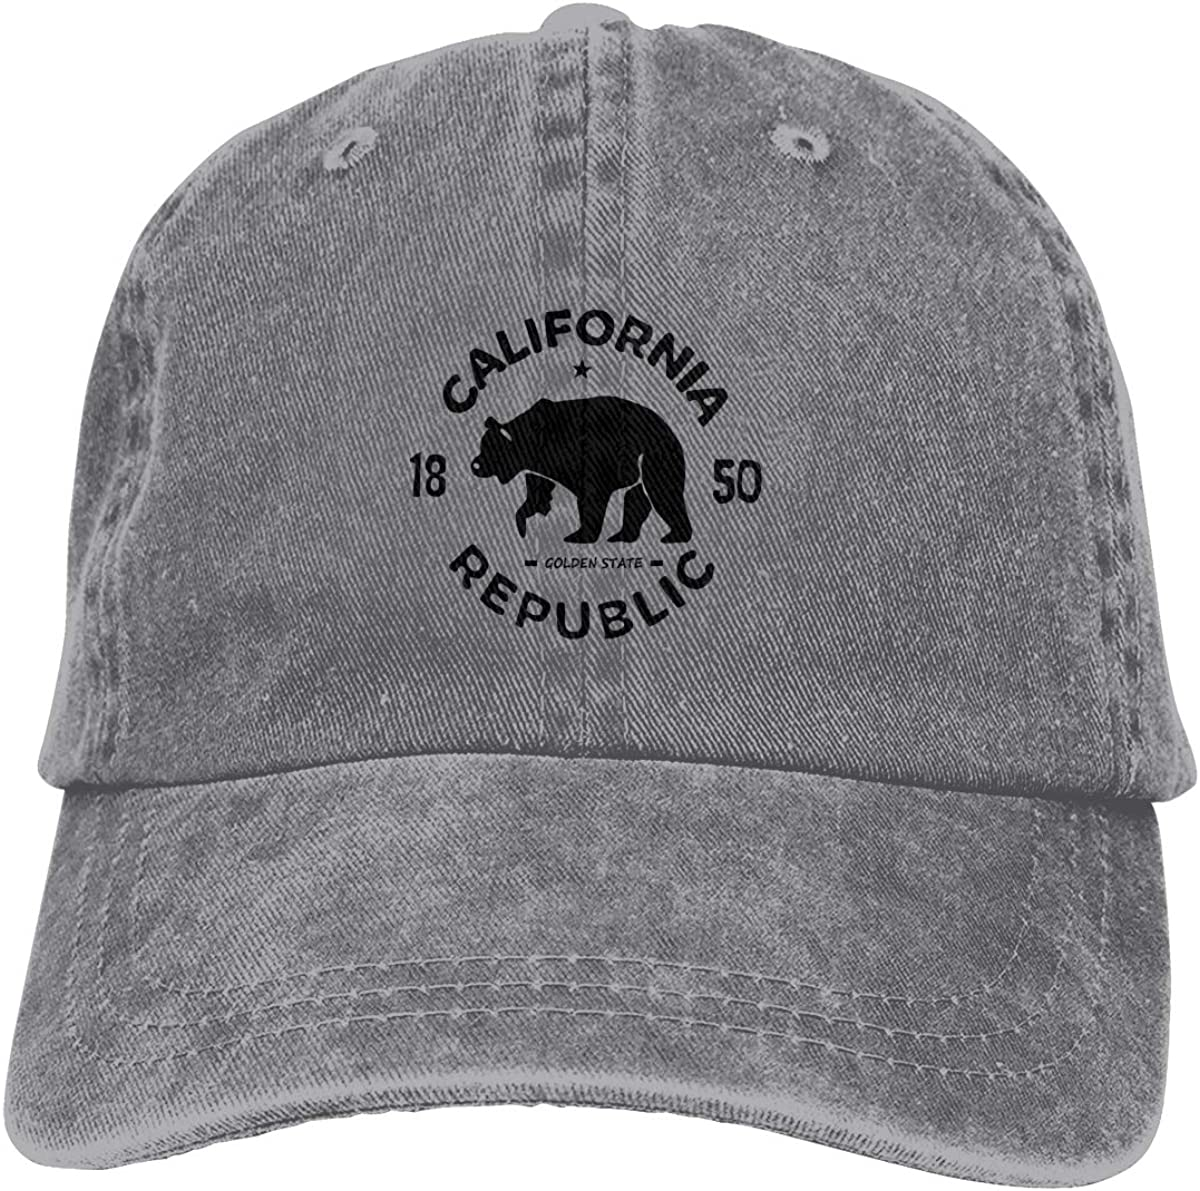 Limited price Unisex Bigfoot Classic Baseball Cap Dad Denim Reservation Hat Cotton 100% So